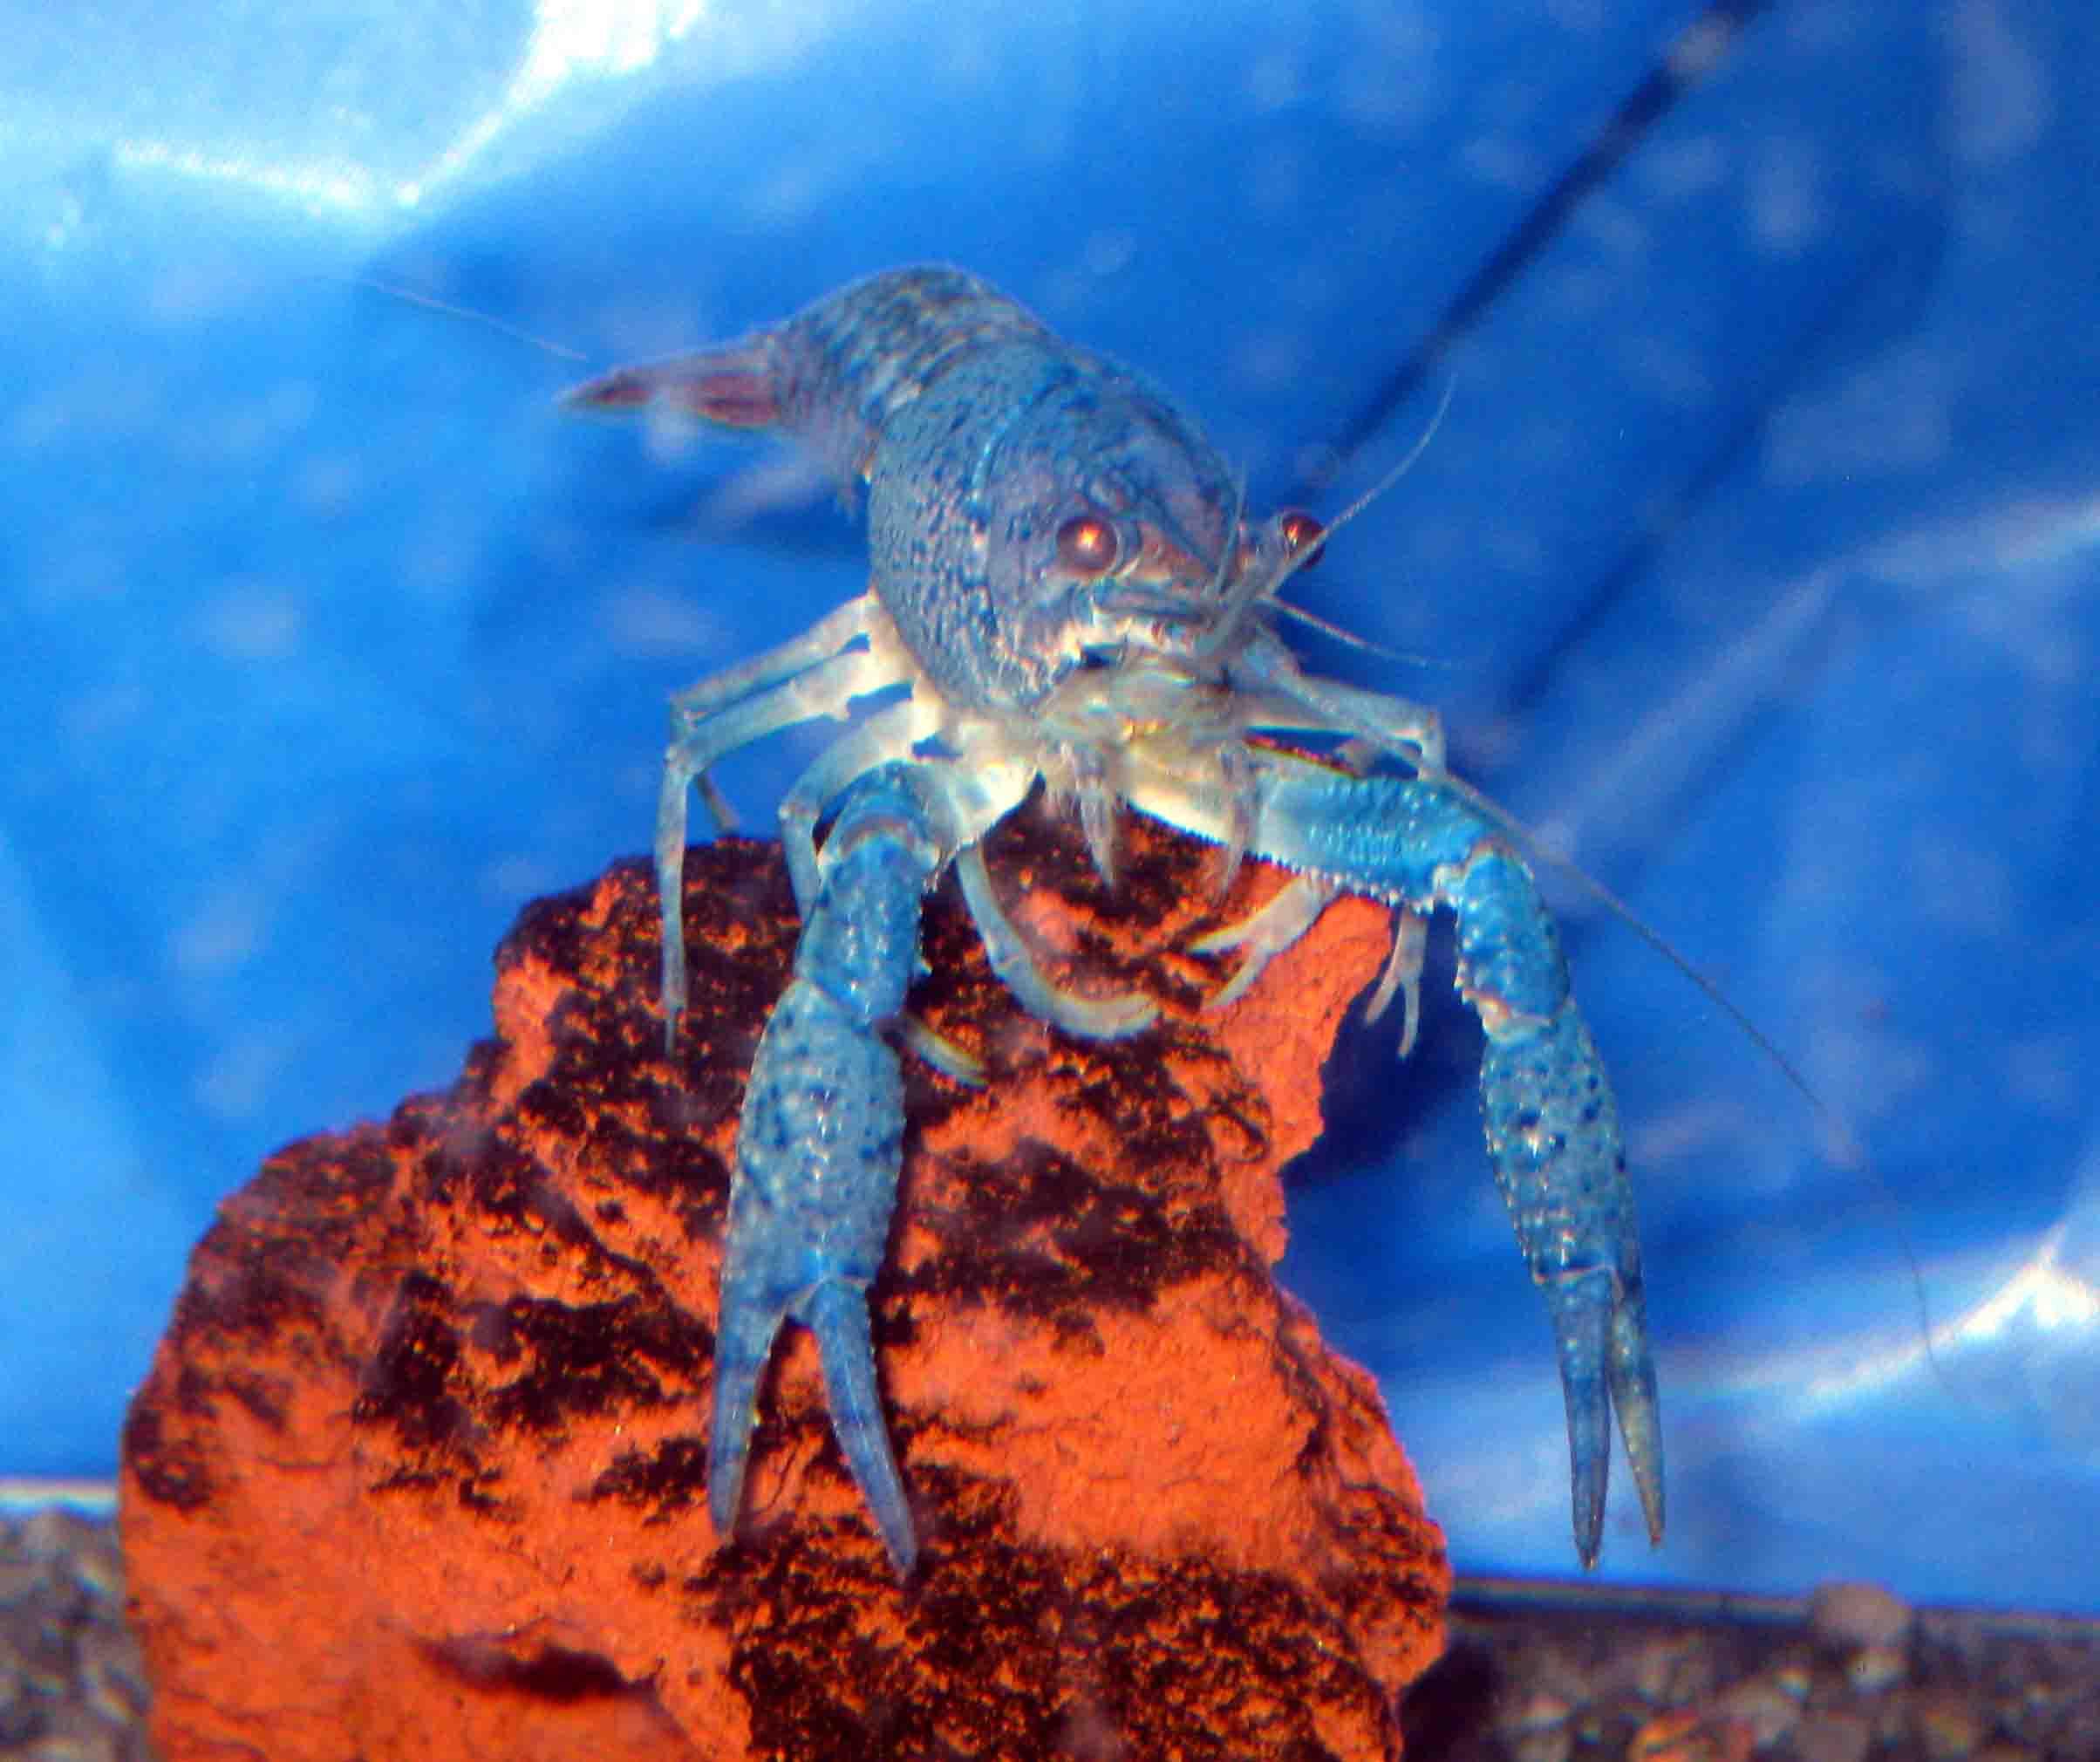 Crayfish Vs Lobster